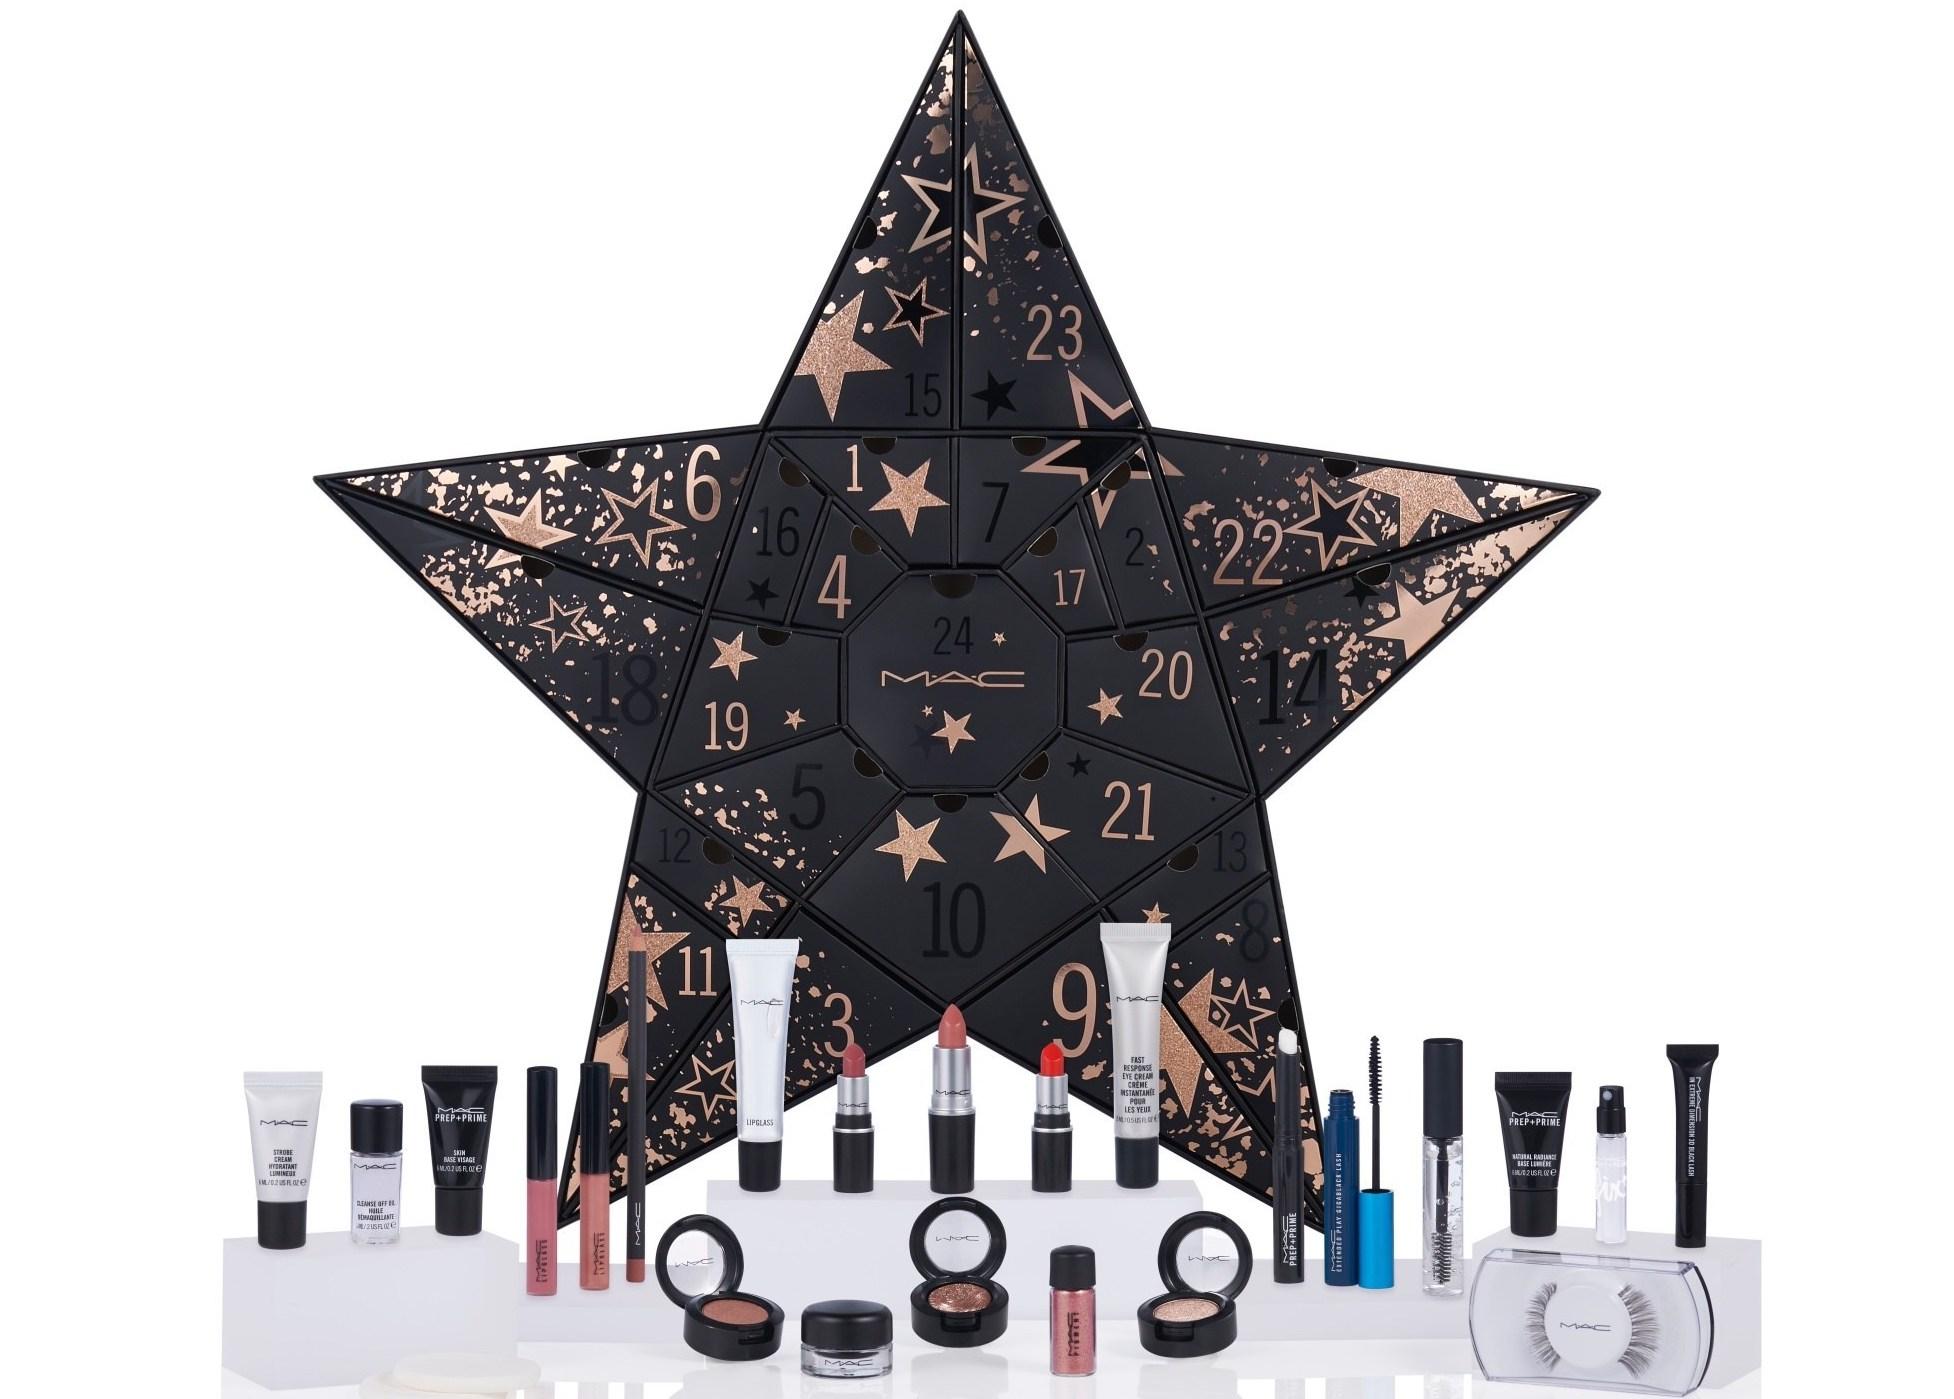 mac-cosmetics-advent-calendar-2019.jpg